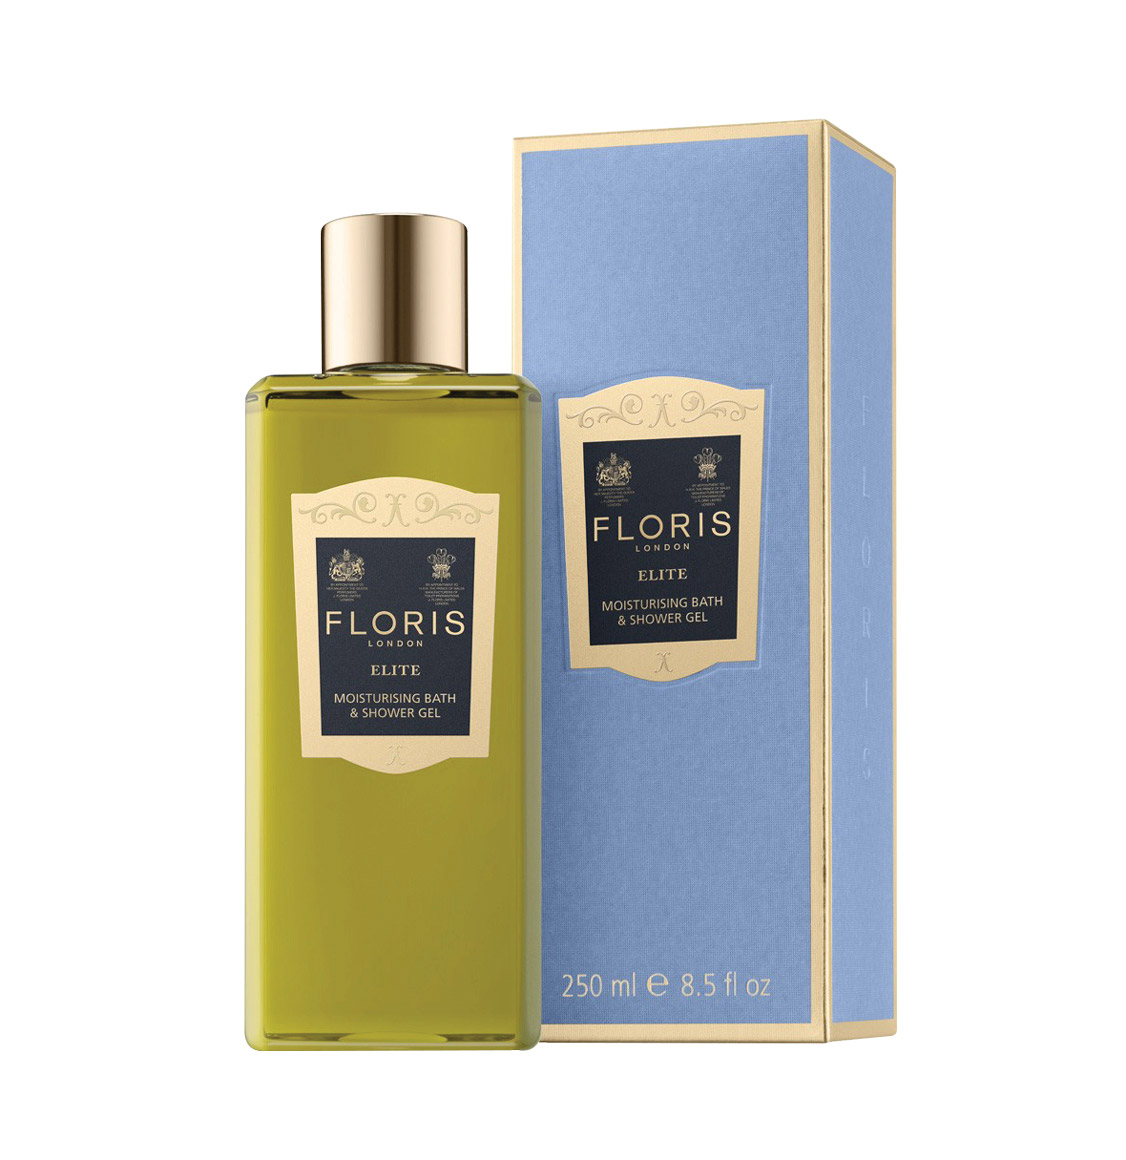 Floris London Elite Moisturising Bath And Shower Gel 250ml